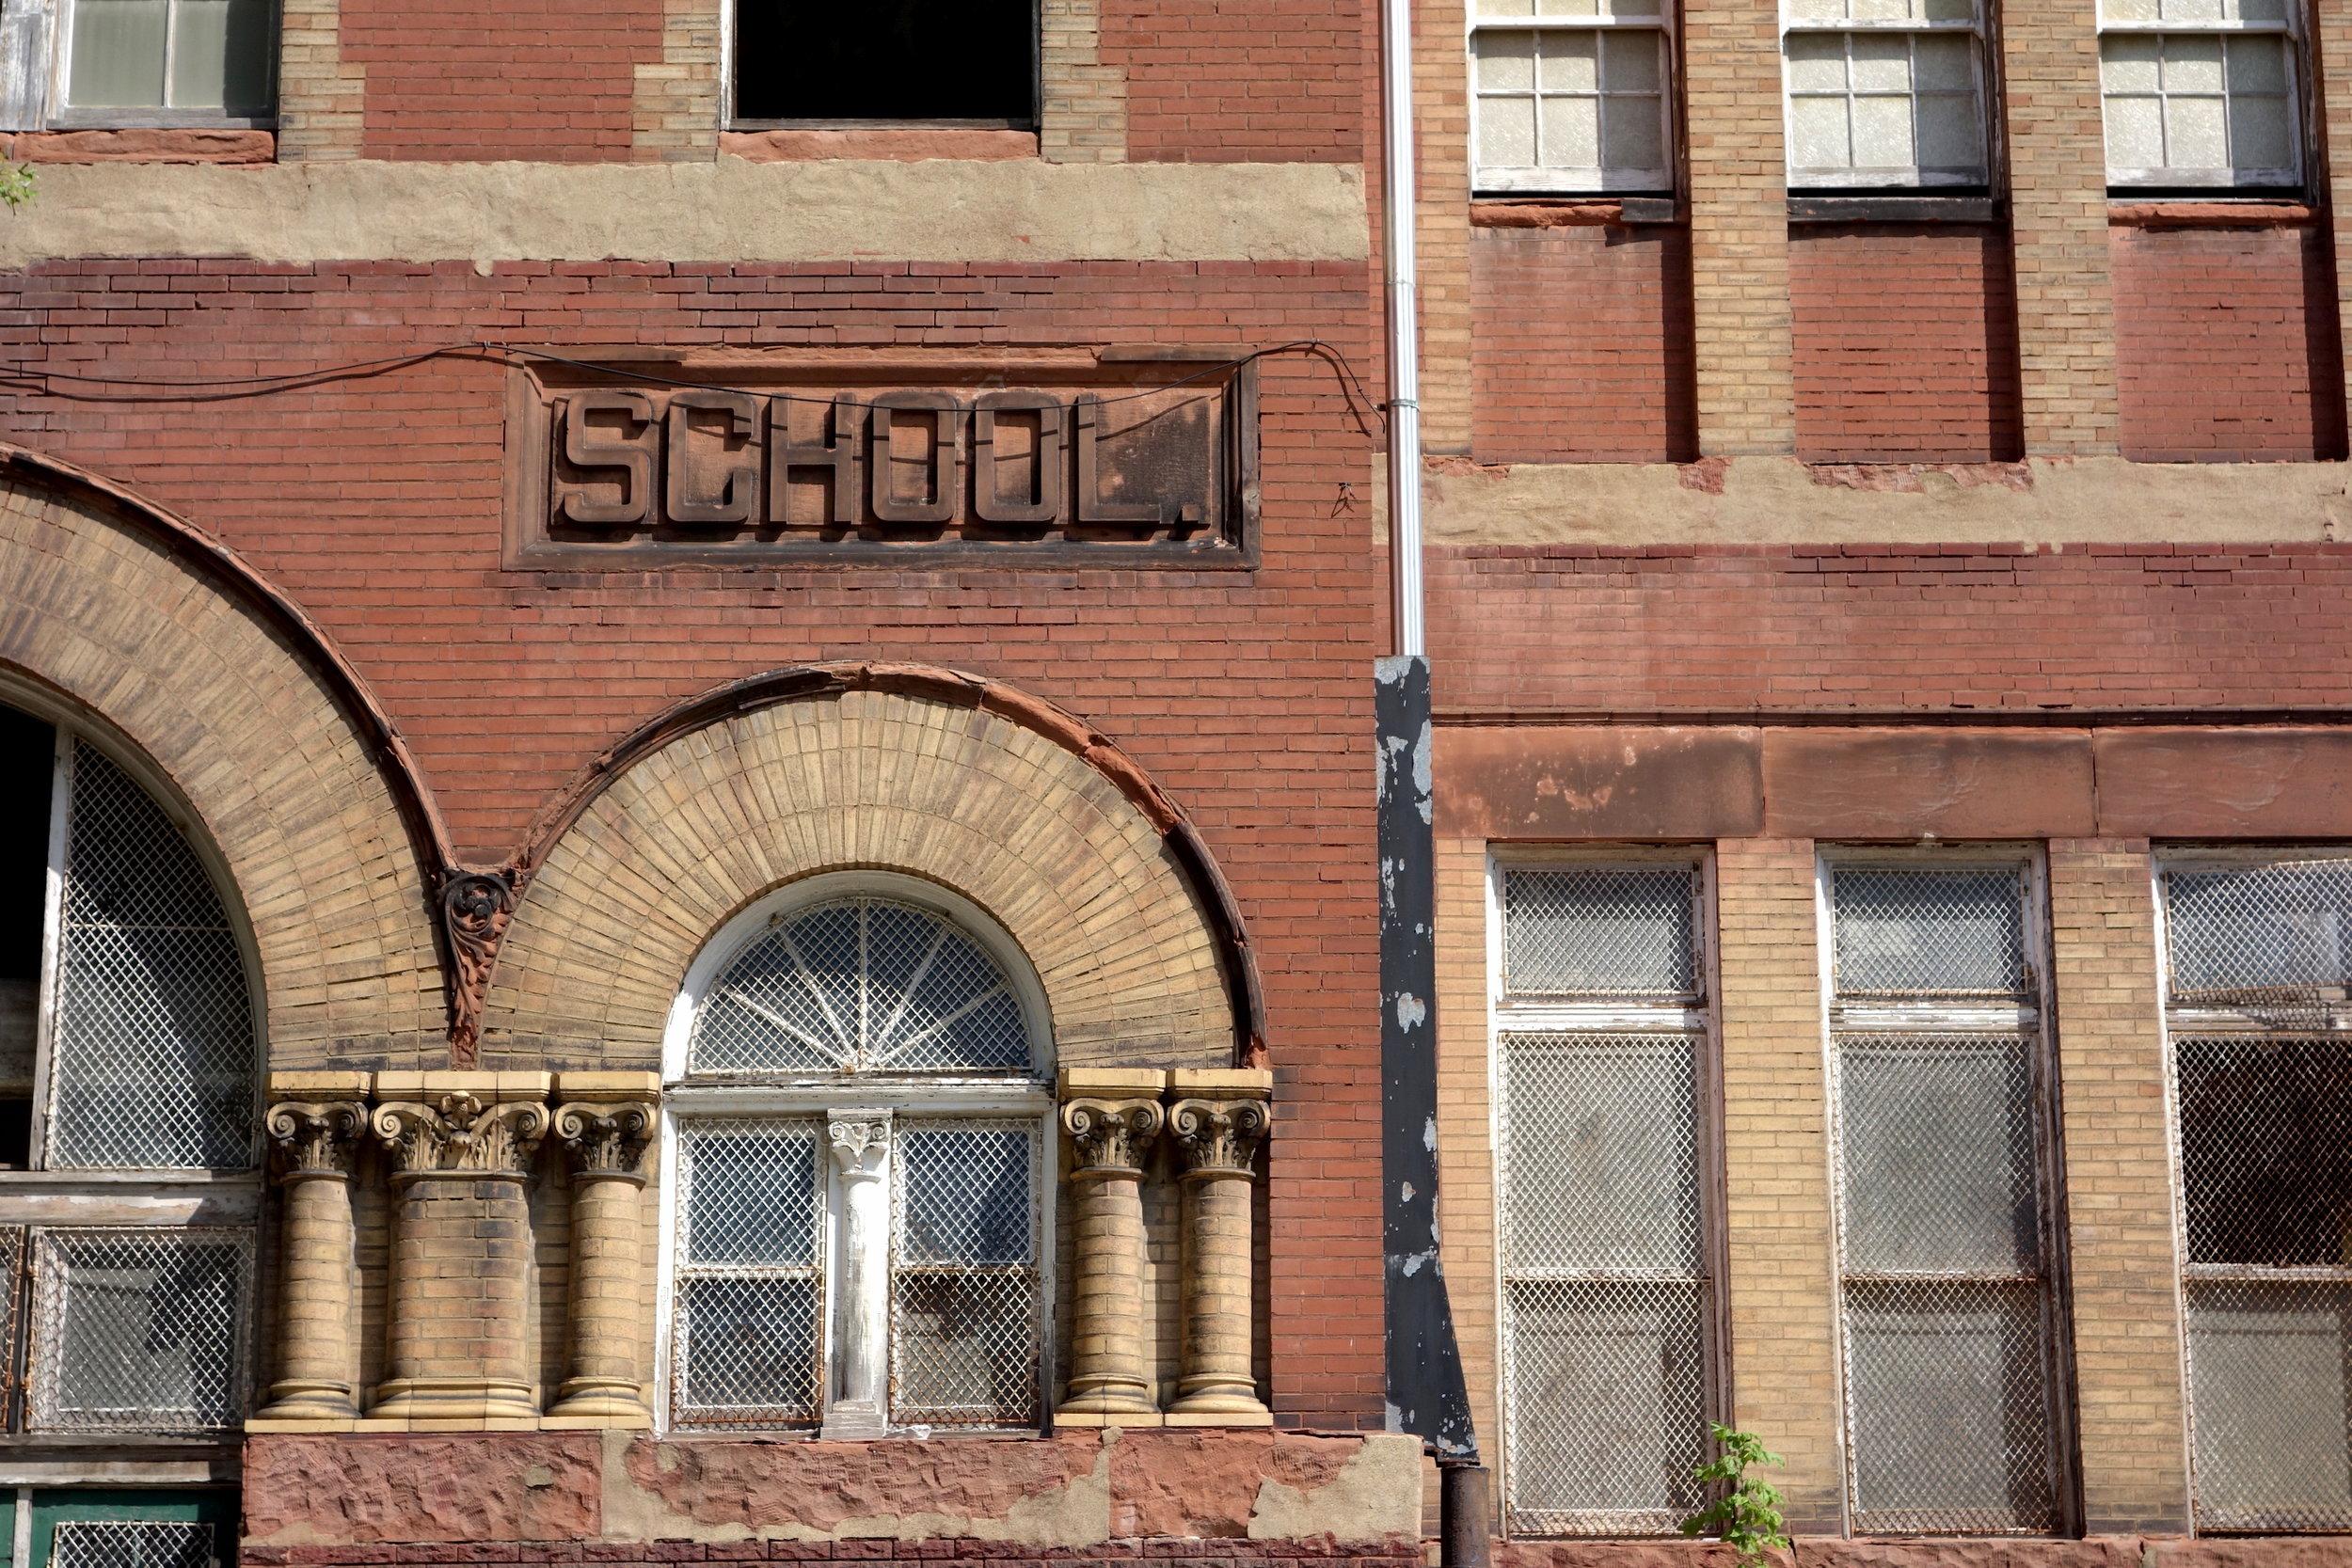 Figure 19. Harrison Elementary School, built in 1895, now vacant in St. Louis, 2016. Photograph by Joseph Heathcott.